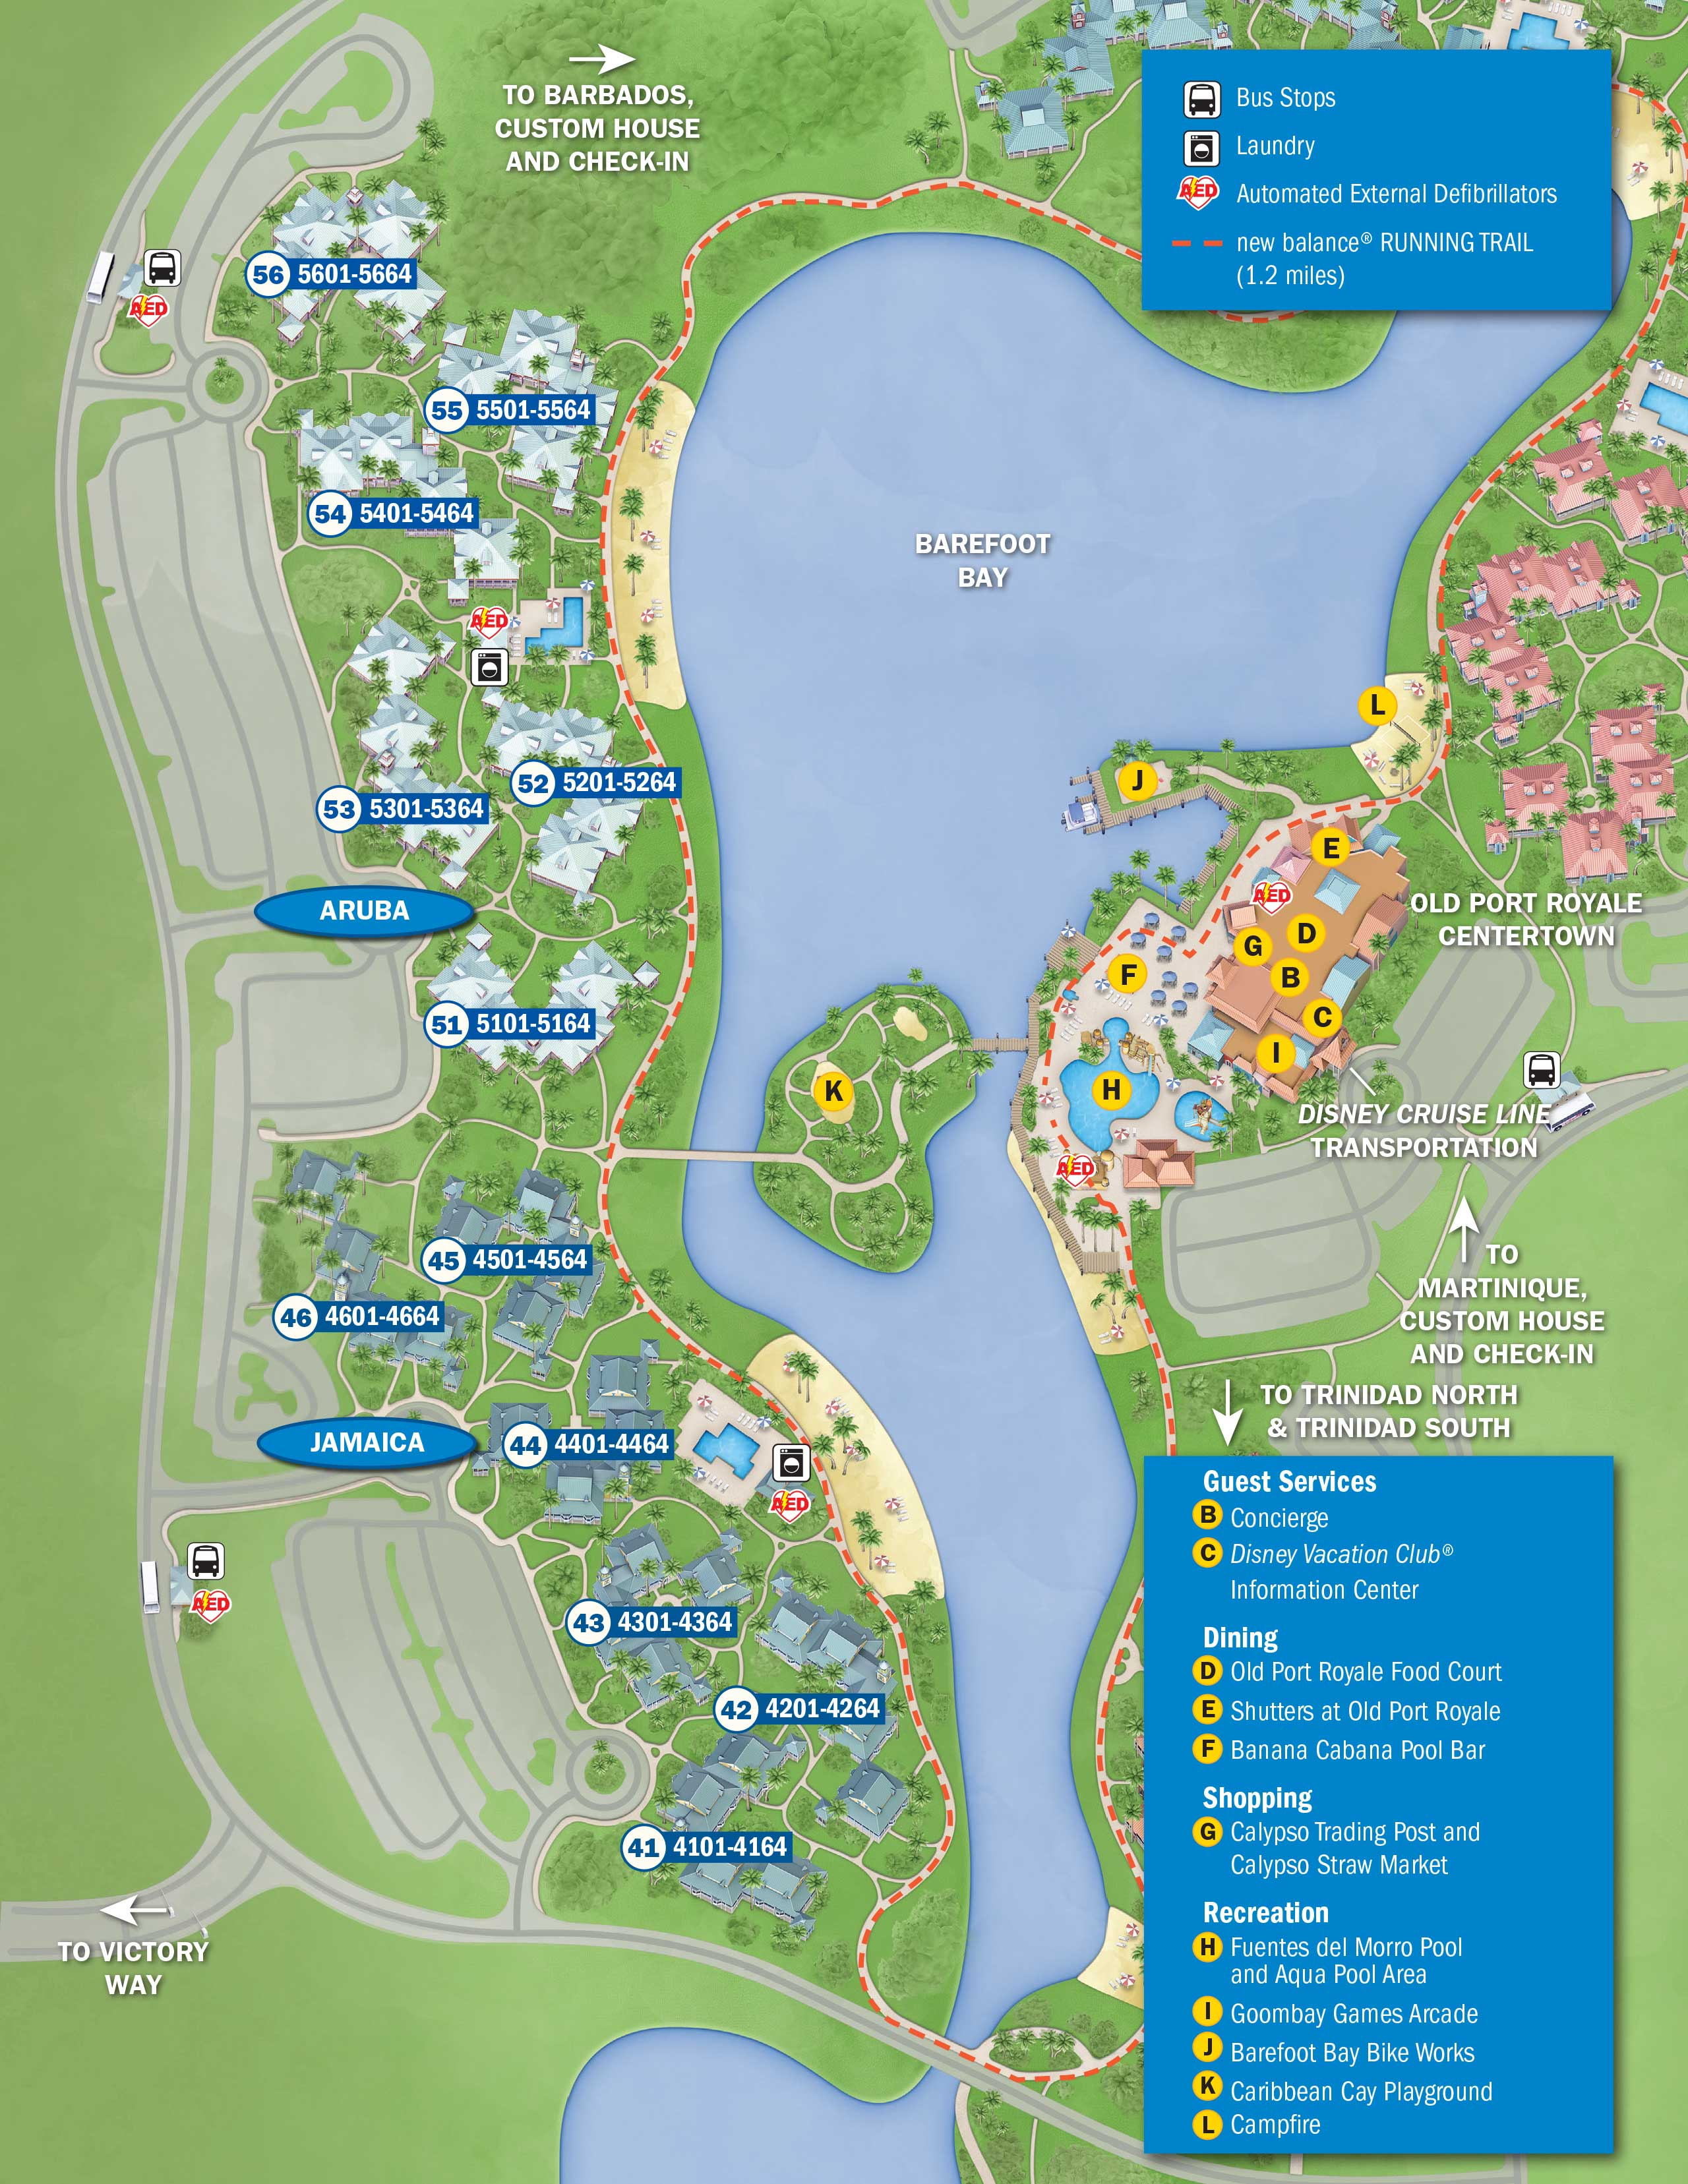 April 2017 Walt Disney World Resort Hotel Maps - Photo 15 of 33